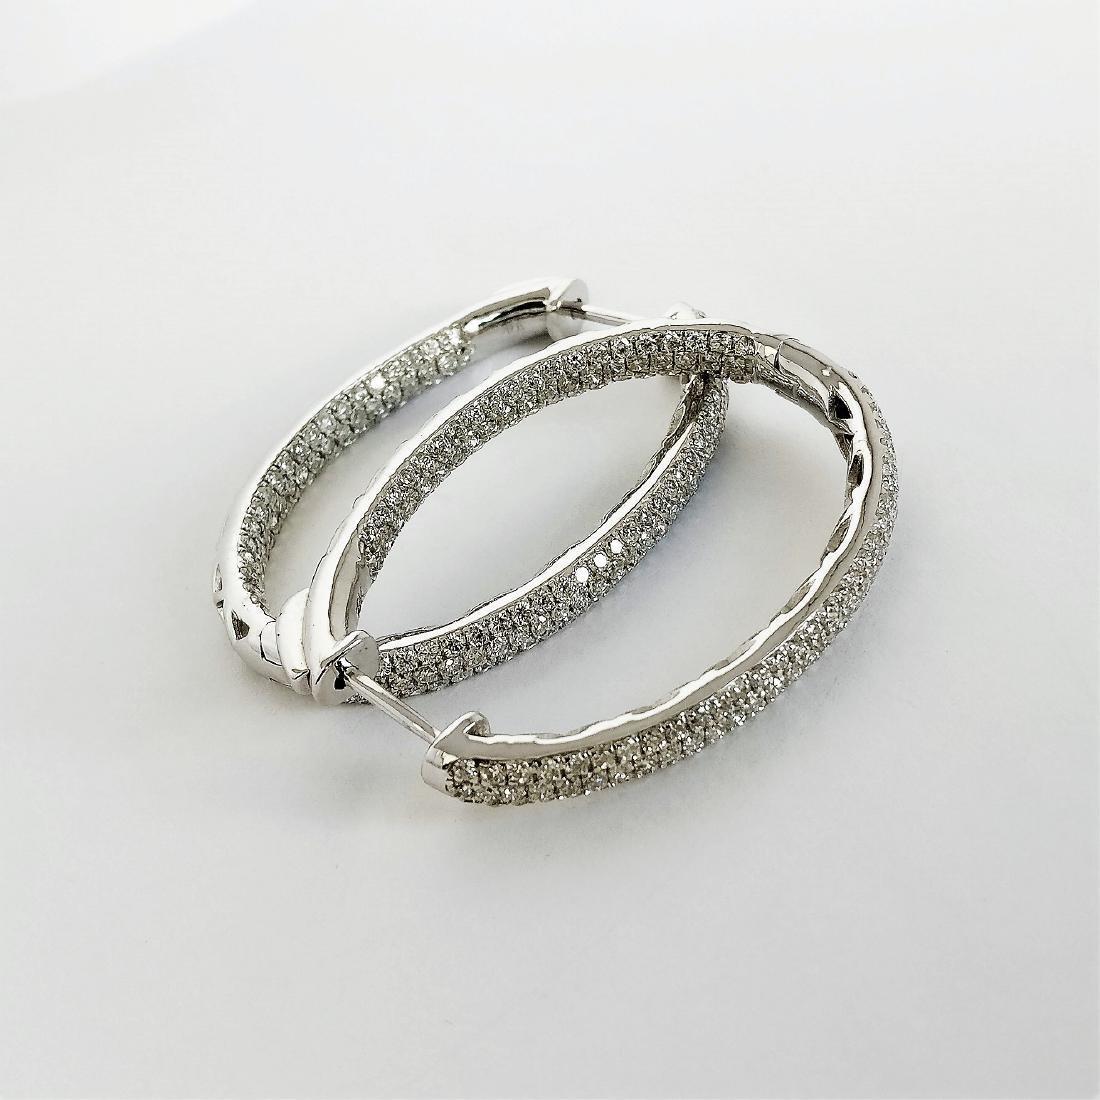 Ladies Earrings with Diamonds total 5.84 ct